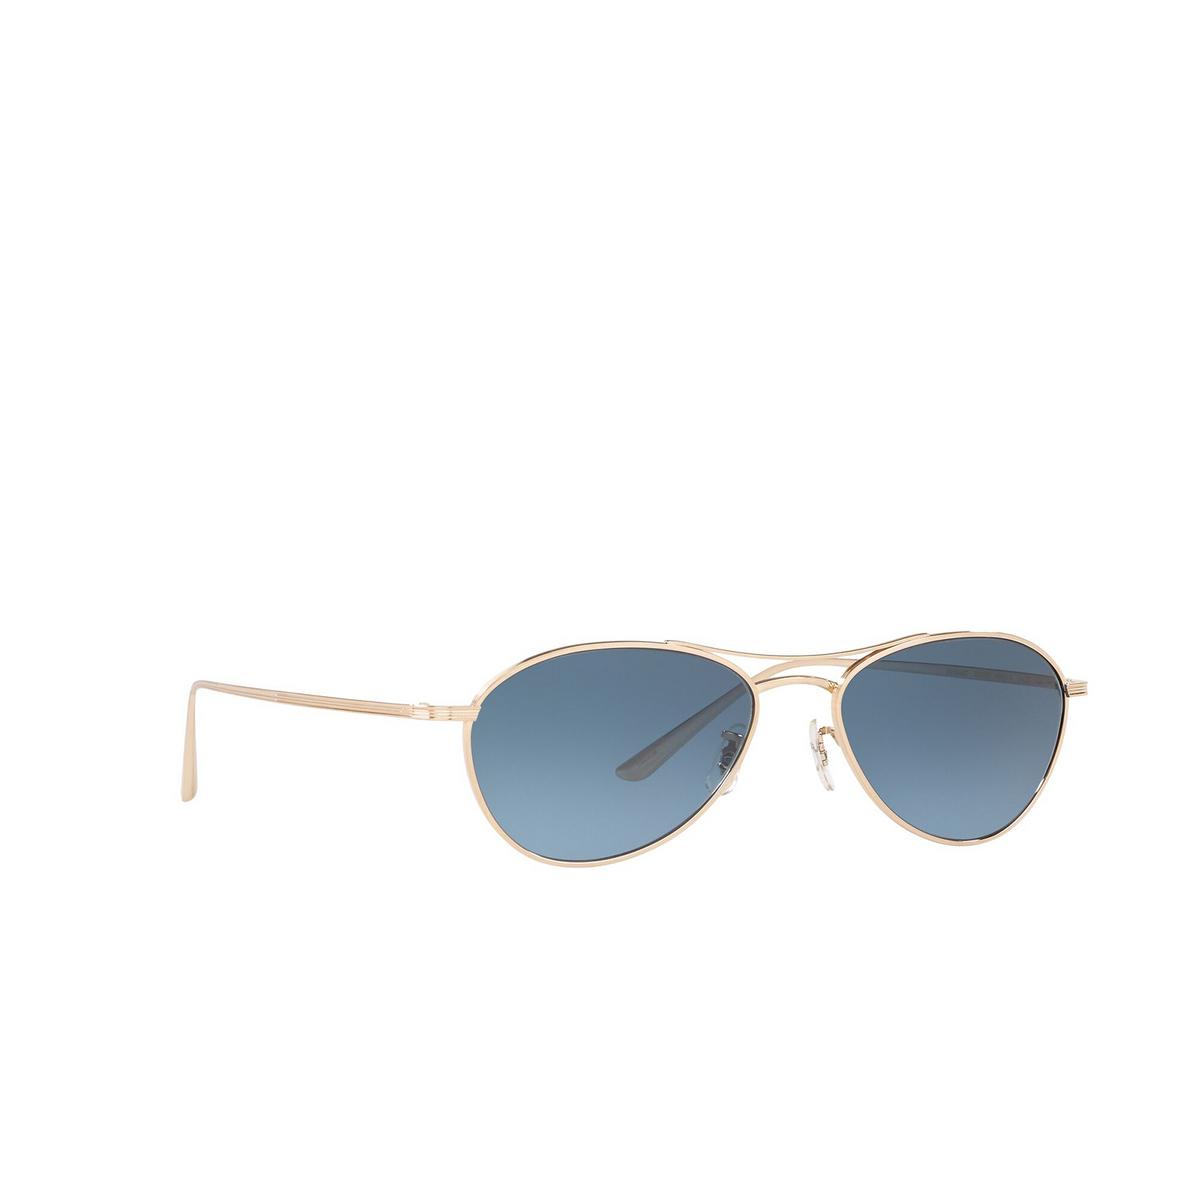 Oliver Peoples® Aviator Sunglasses: Aero La OV1245ST color Gold 5292Q8 - three-quarters view.